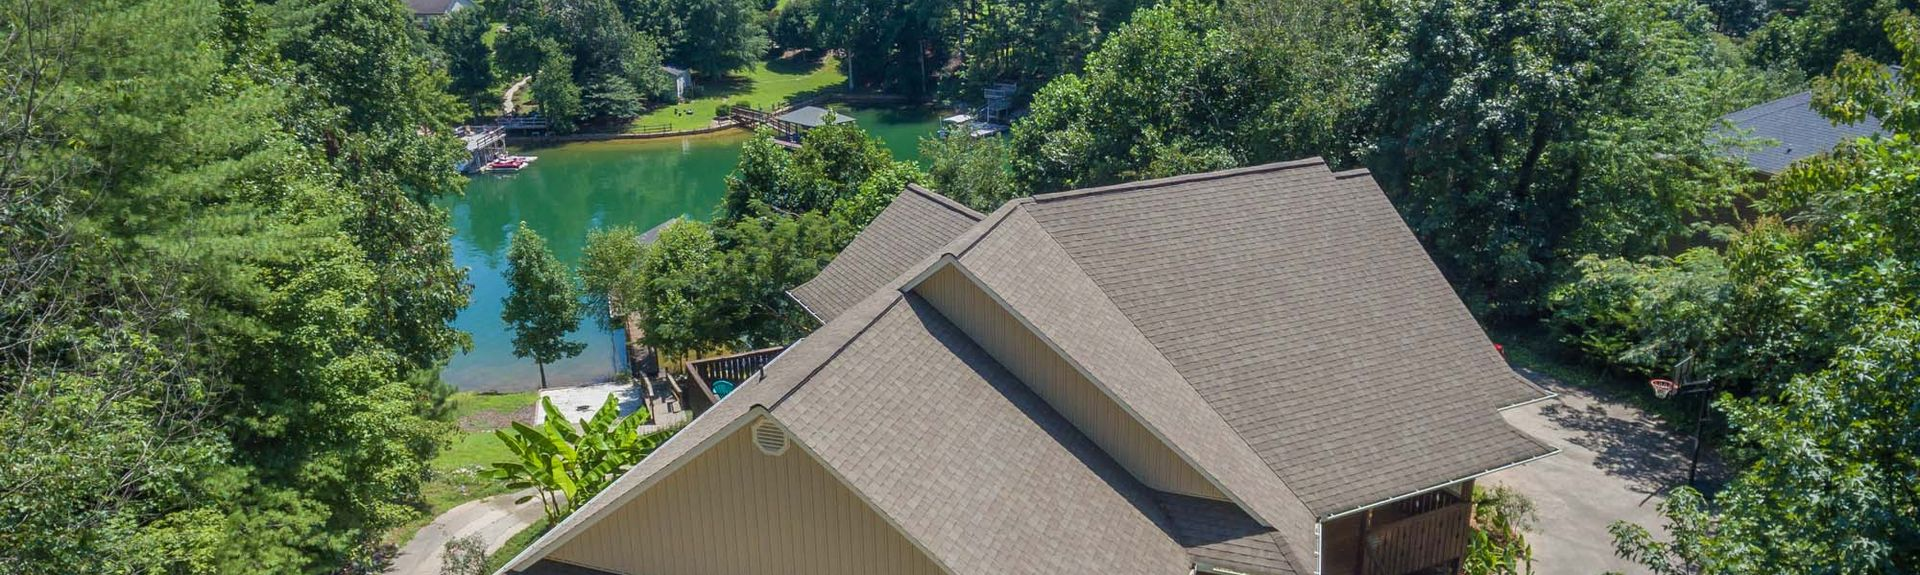 Pine Mountain Golf Course, Connellys Springs, North Carolina, Vereinigte Staaten